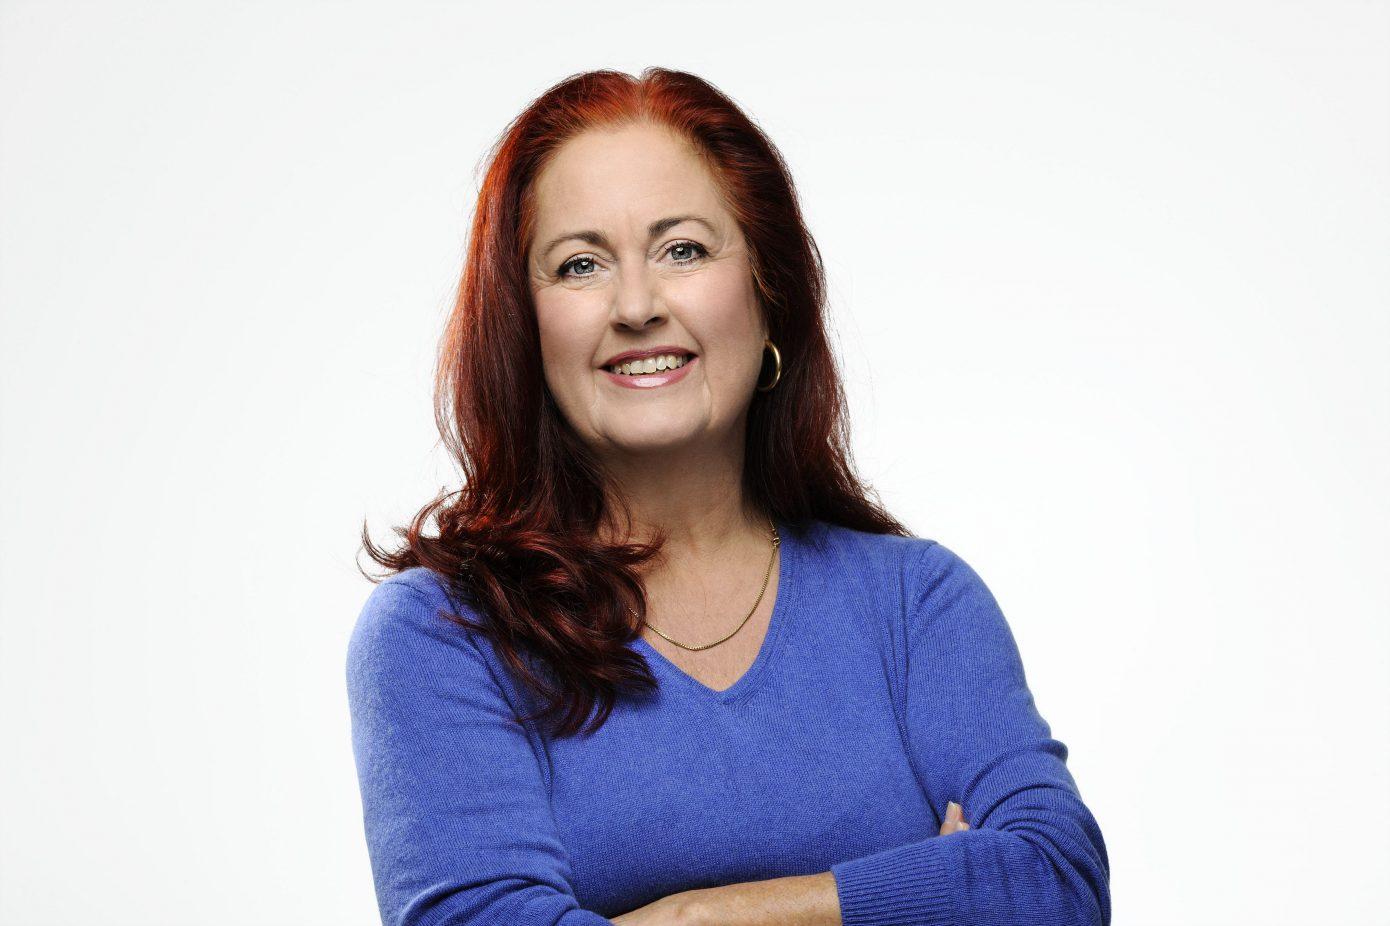 Sylvia Gabelmann, Die Linke, MdB. Bundestagsabgeordneter, Abgeordneter